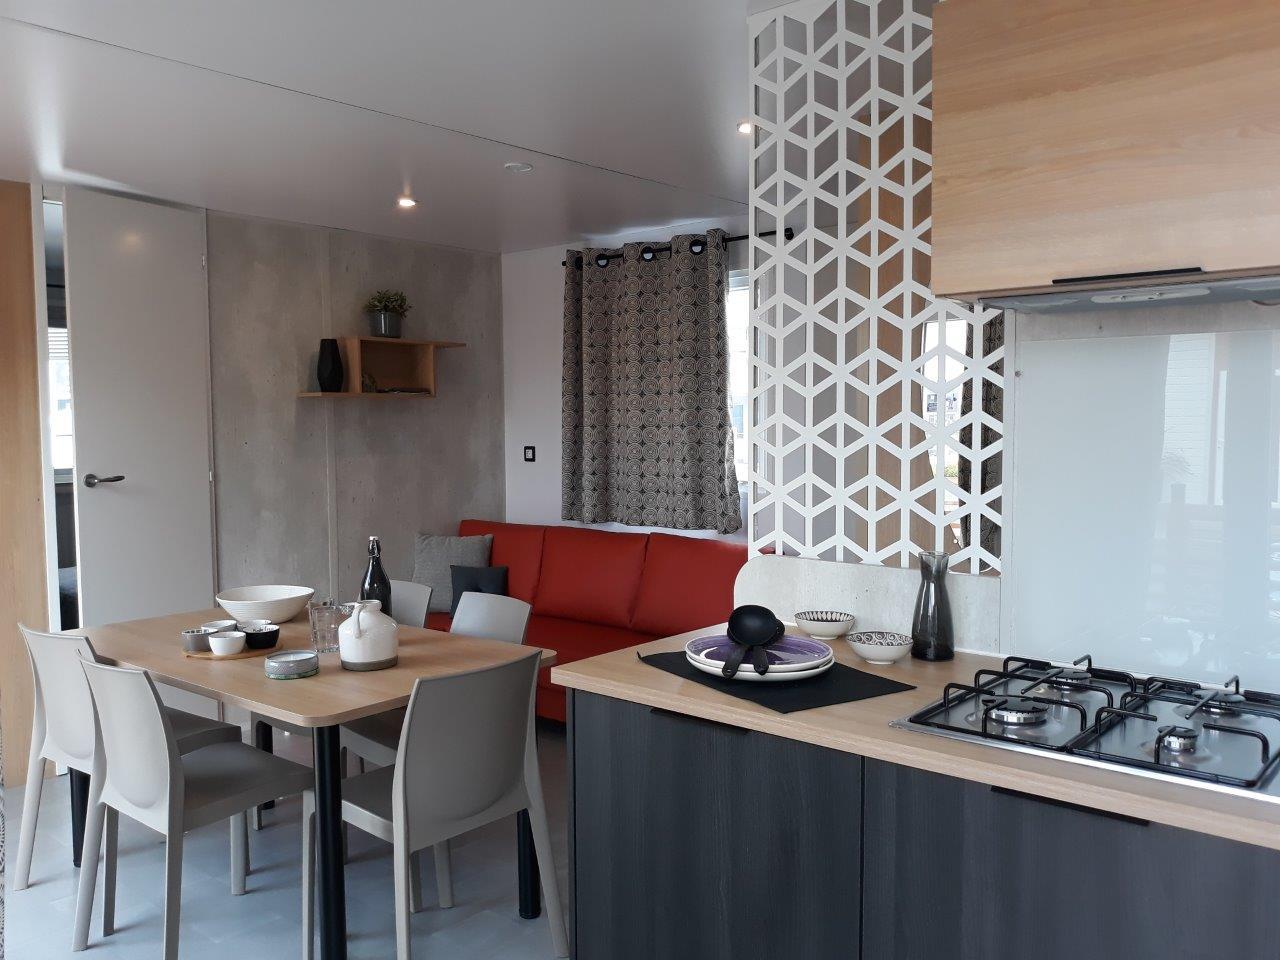 cuisine cottage mobil home sarlat 3 chambres 6 personnes